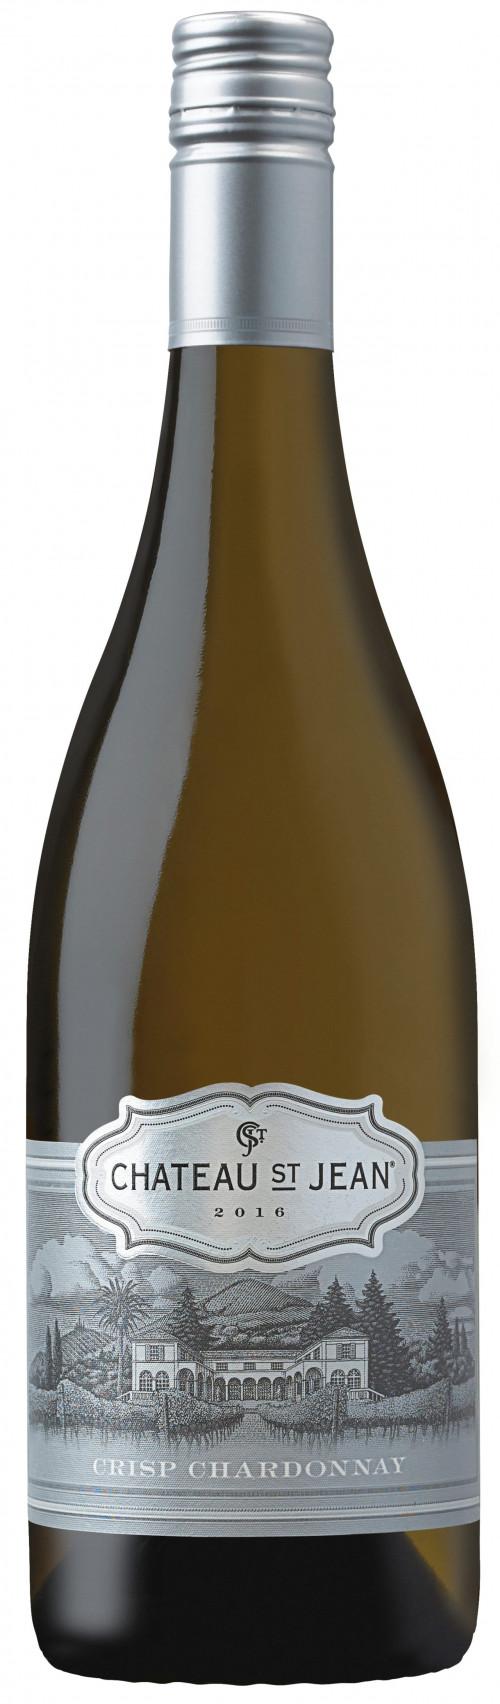 2018 Chateau St. Jean Crisp Chardonnay 750ml